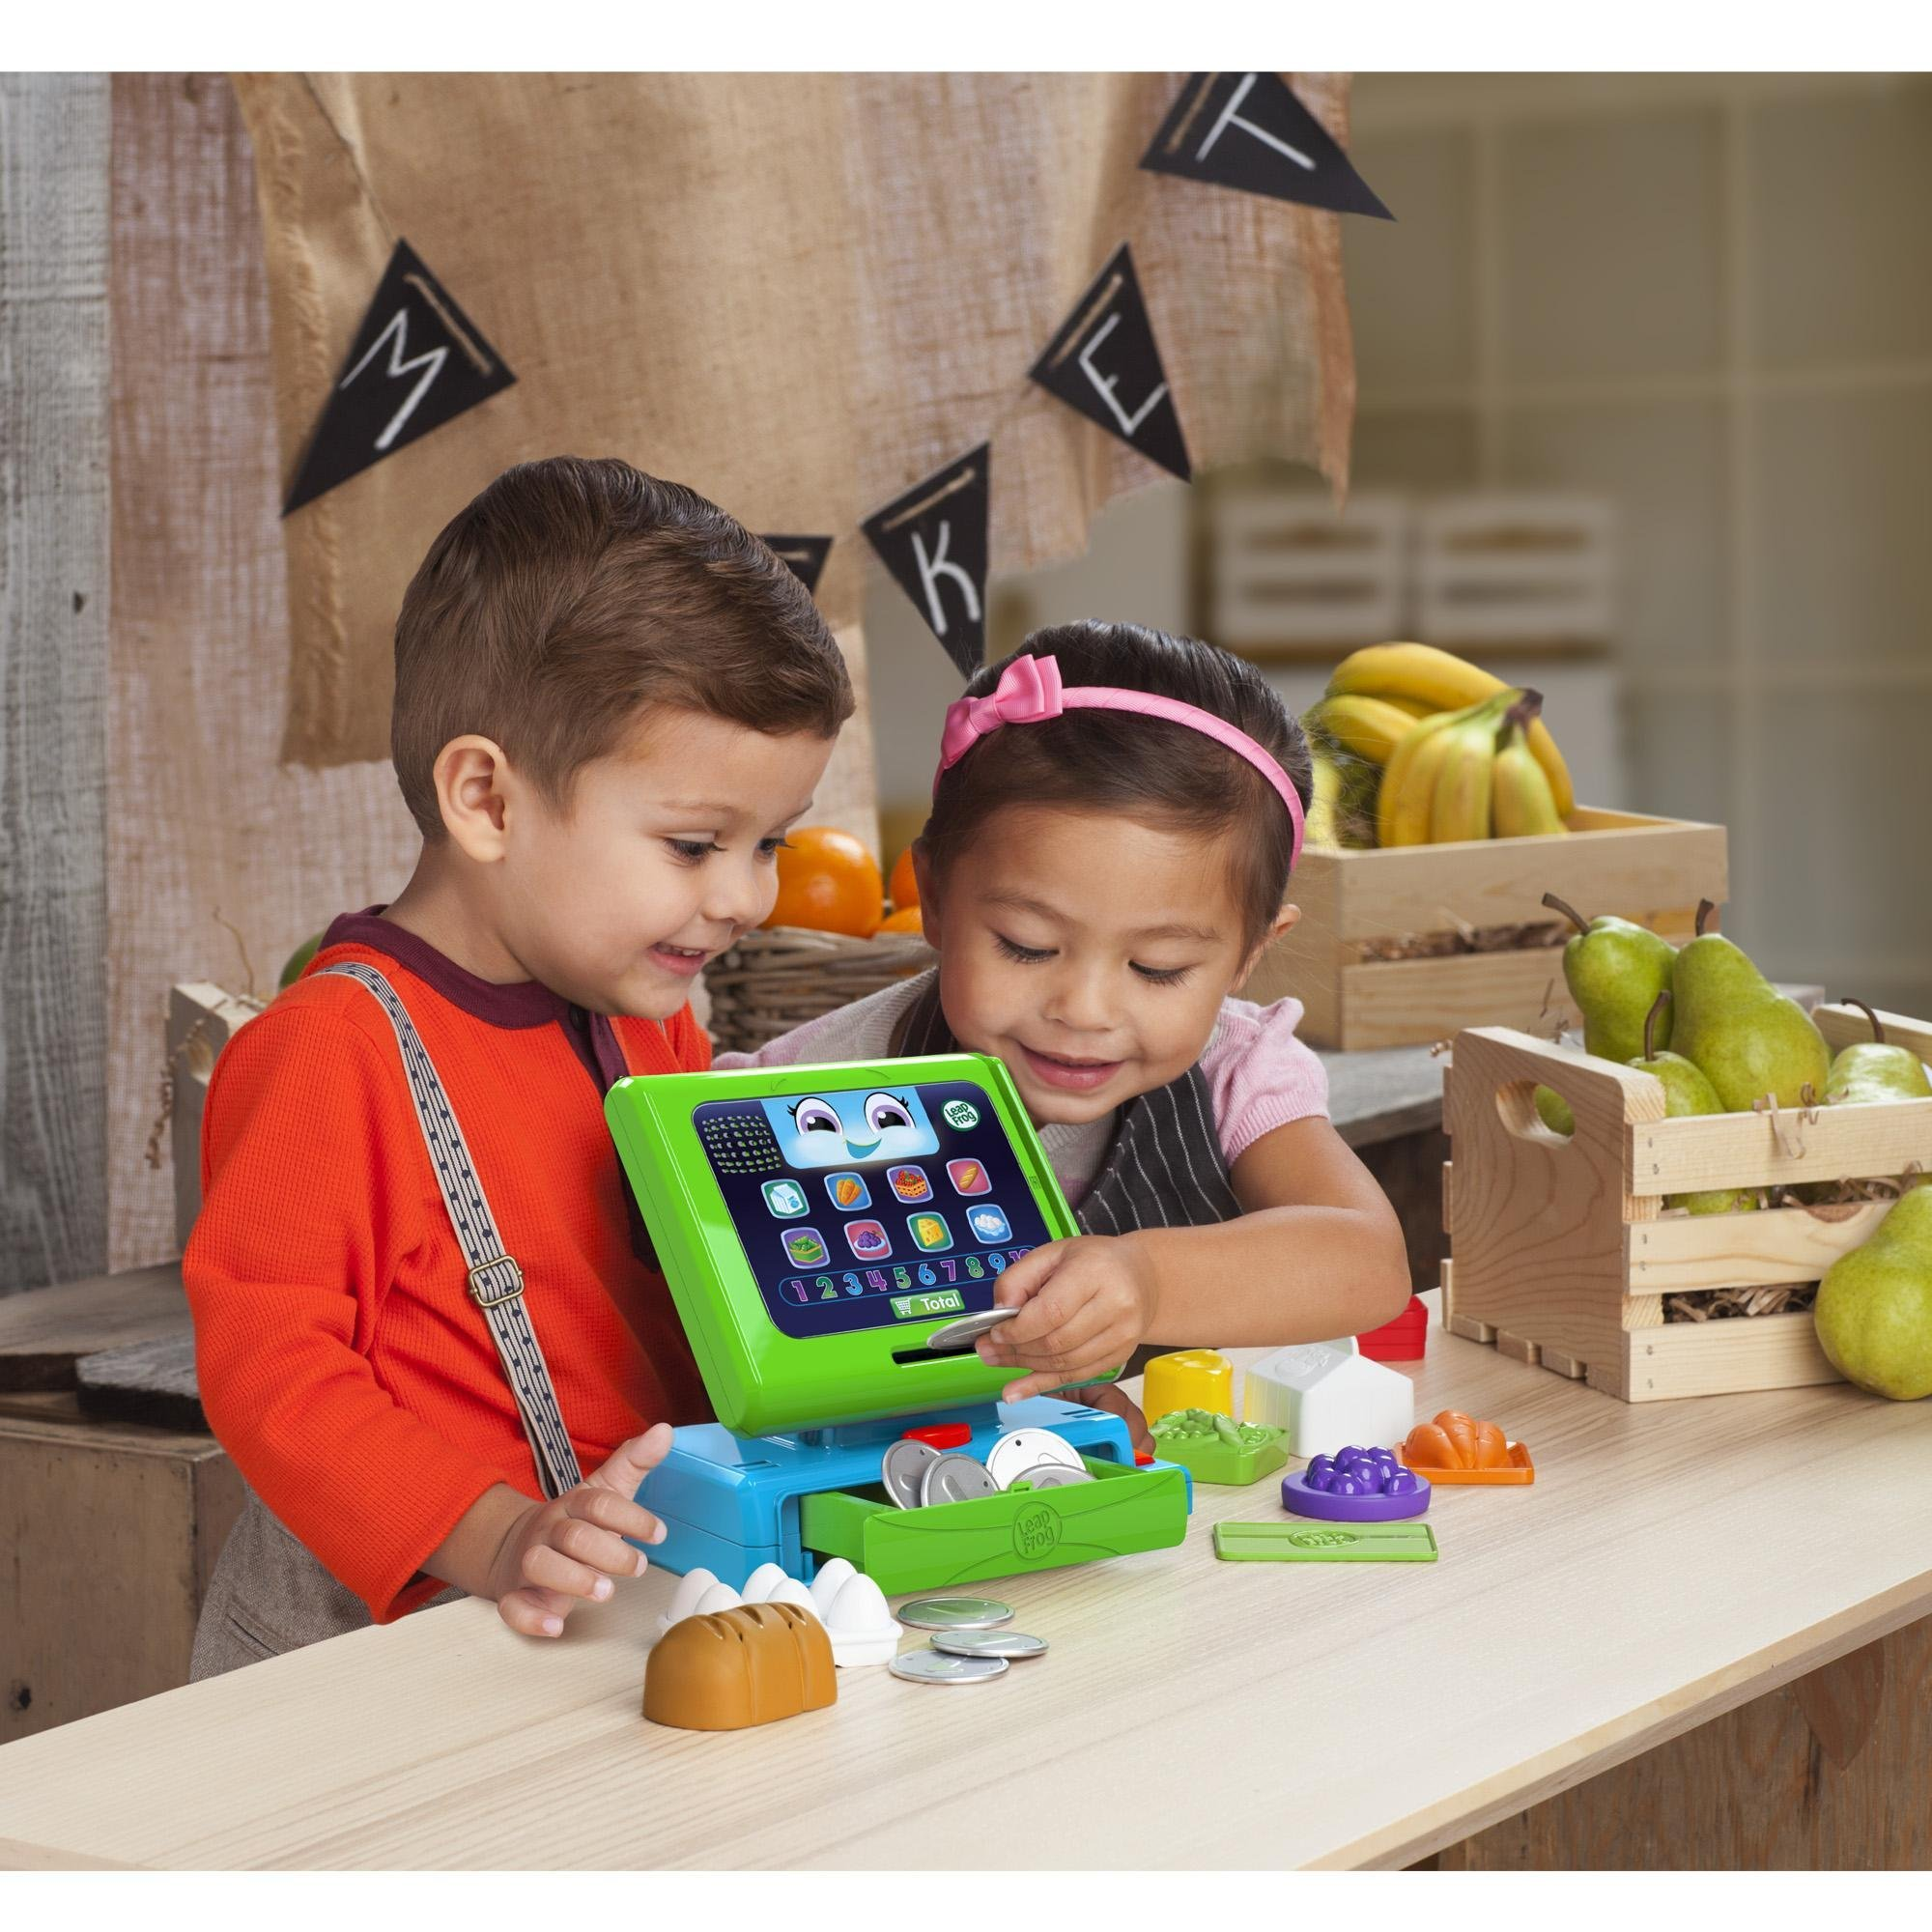 Amazon.com: LeapFrog Count Along Cash Register: Toys & Games